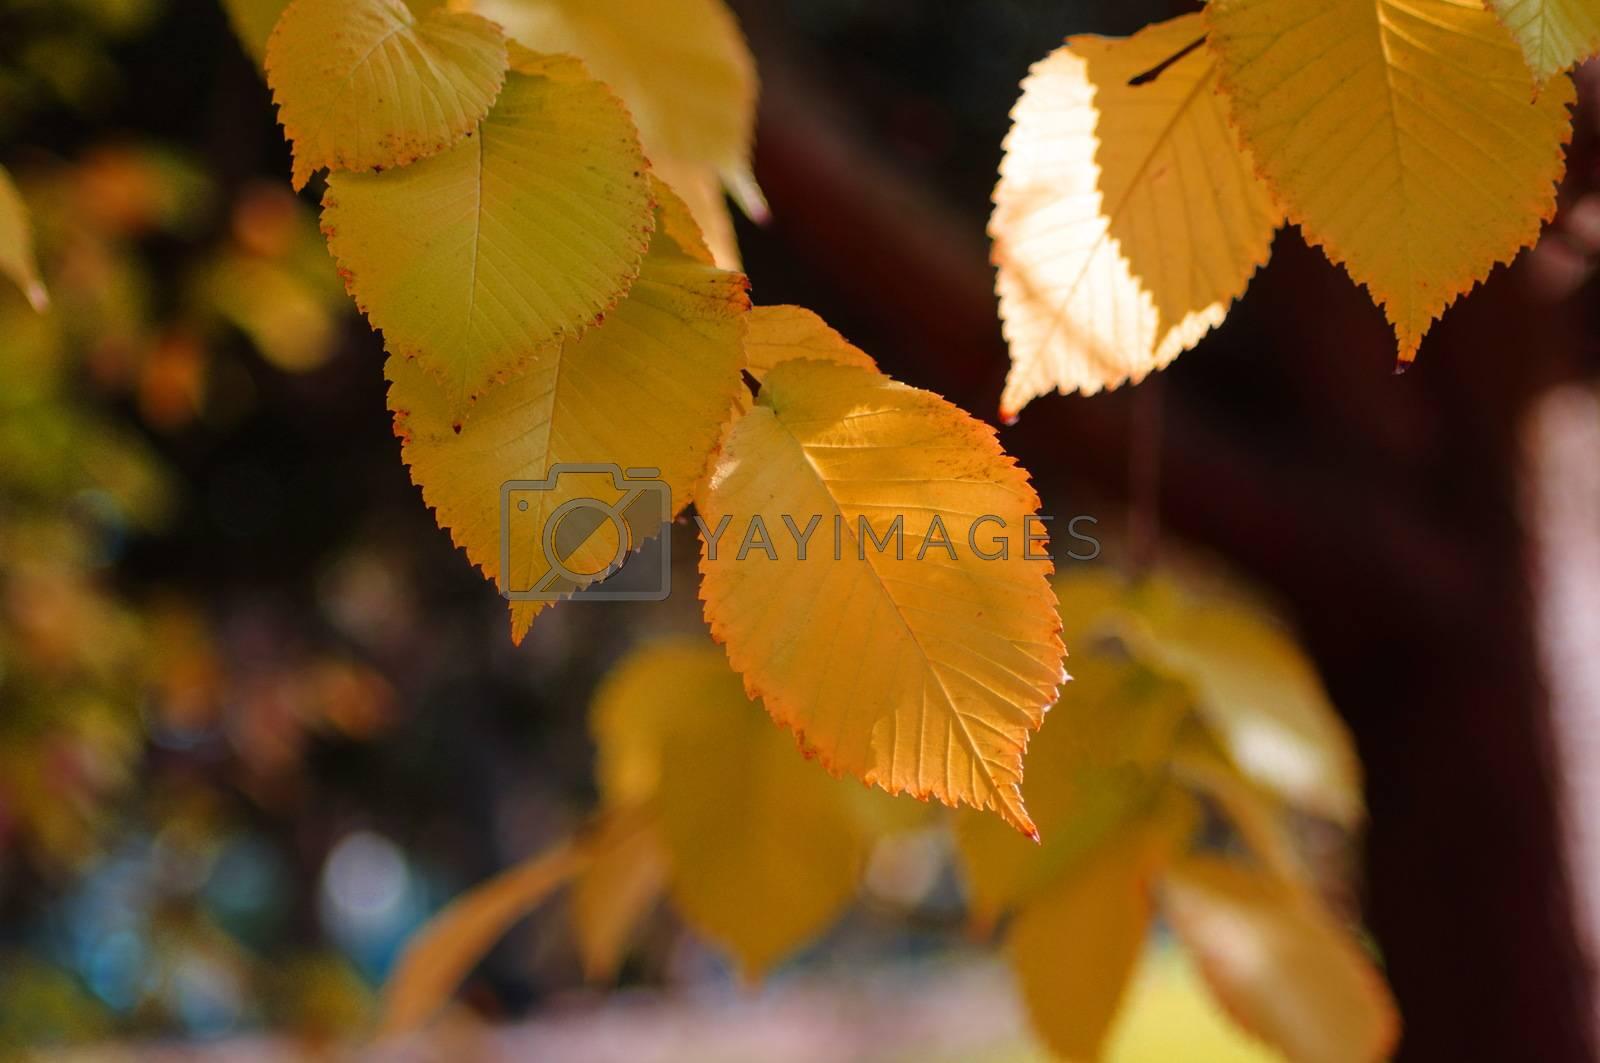 closeup of the autumn leaves